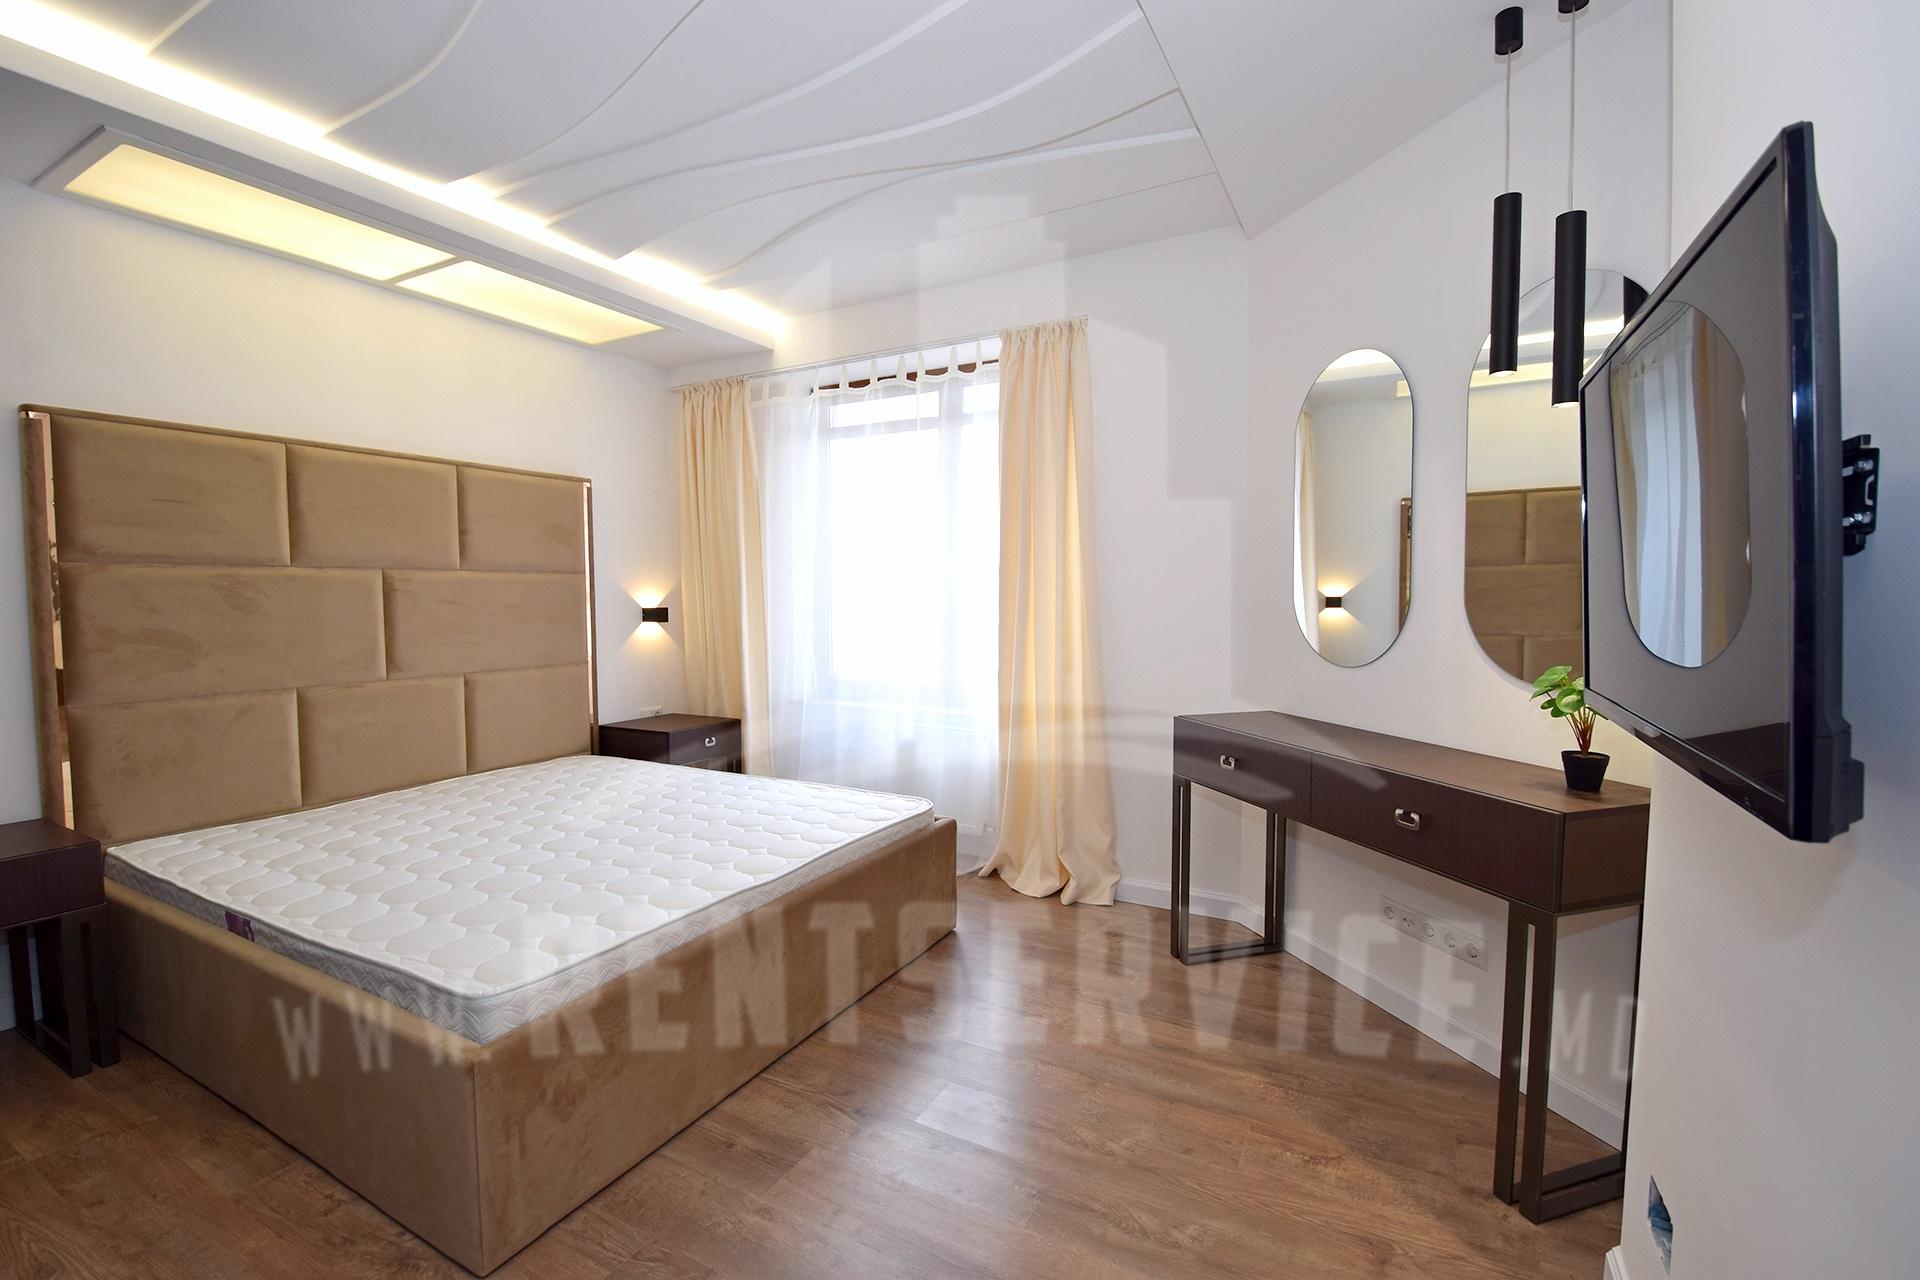 291_apartment_4.JPG